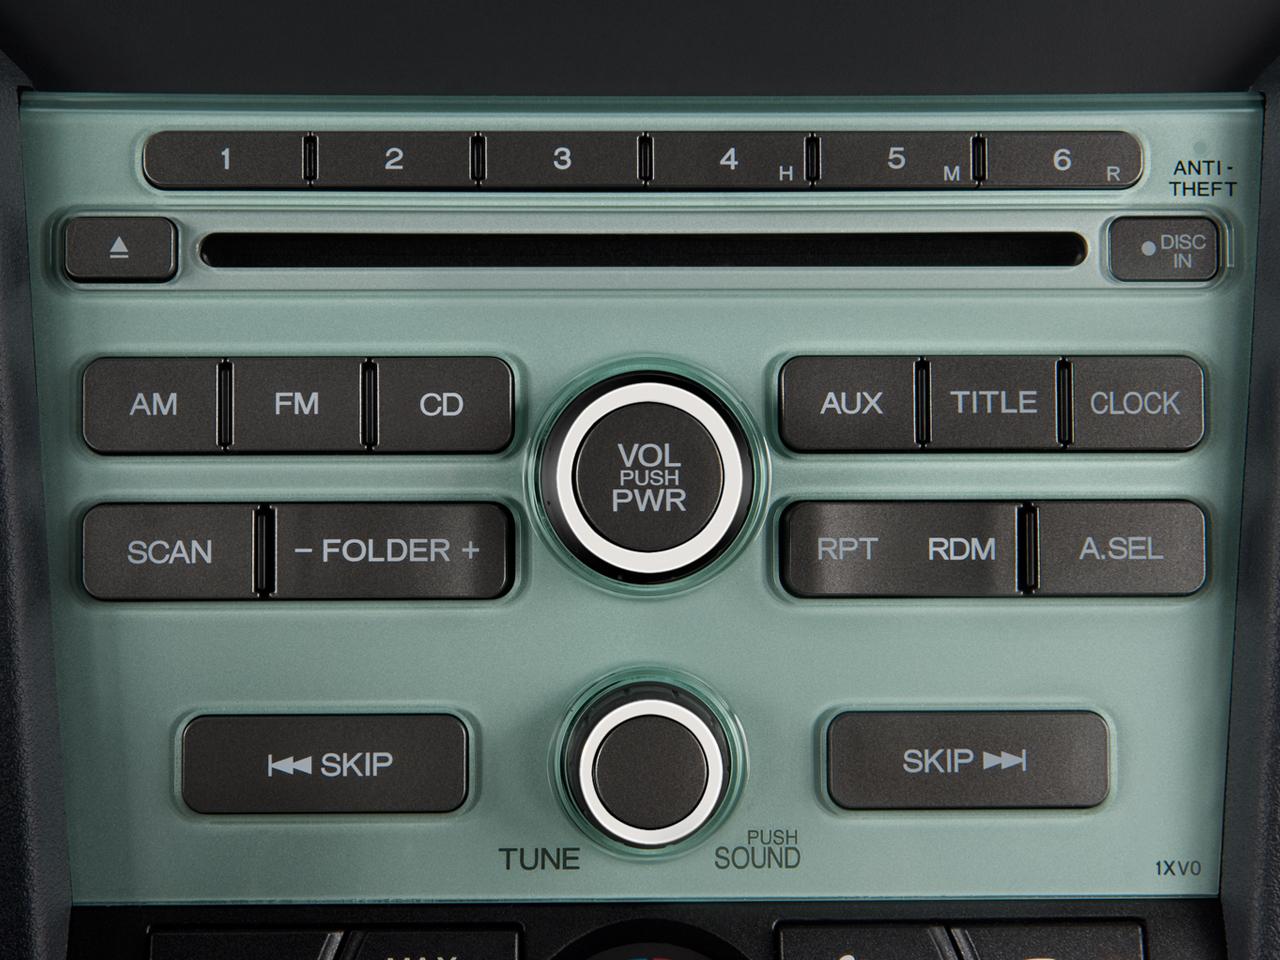 03 05 04 Honda Pilot Radio Cd Player Tape 2003 2004 2005 5237